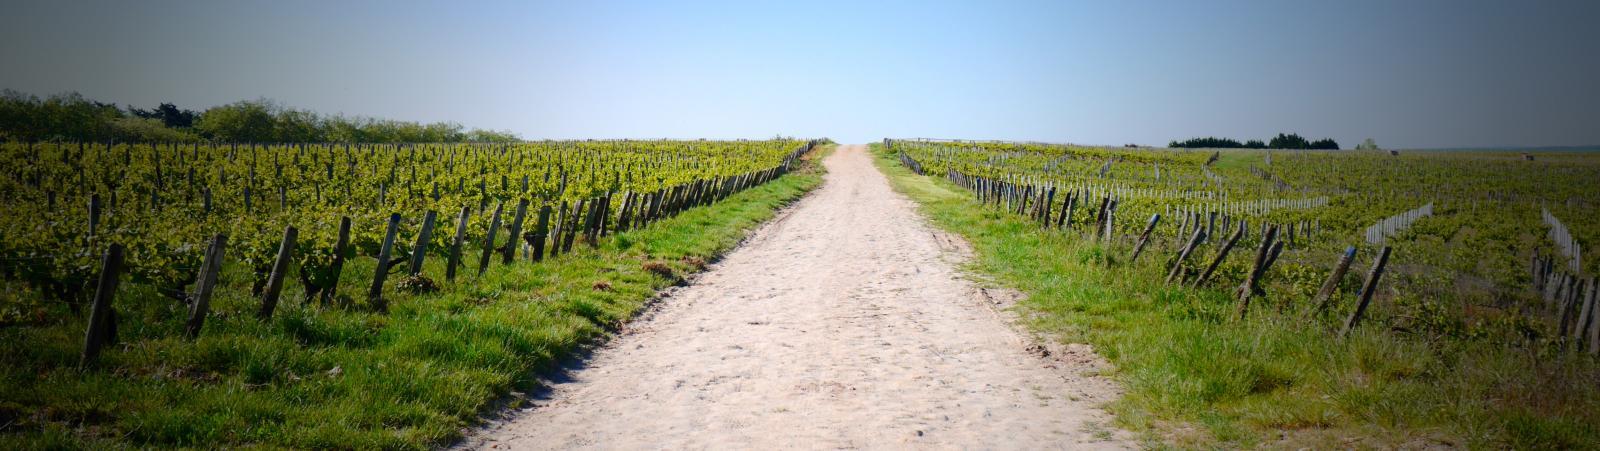 La voie romaine